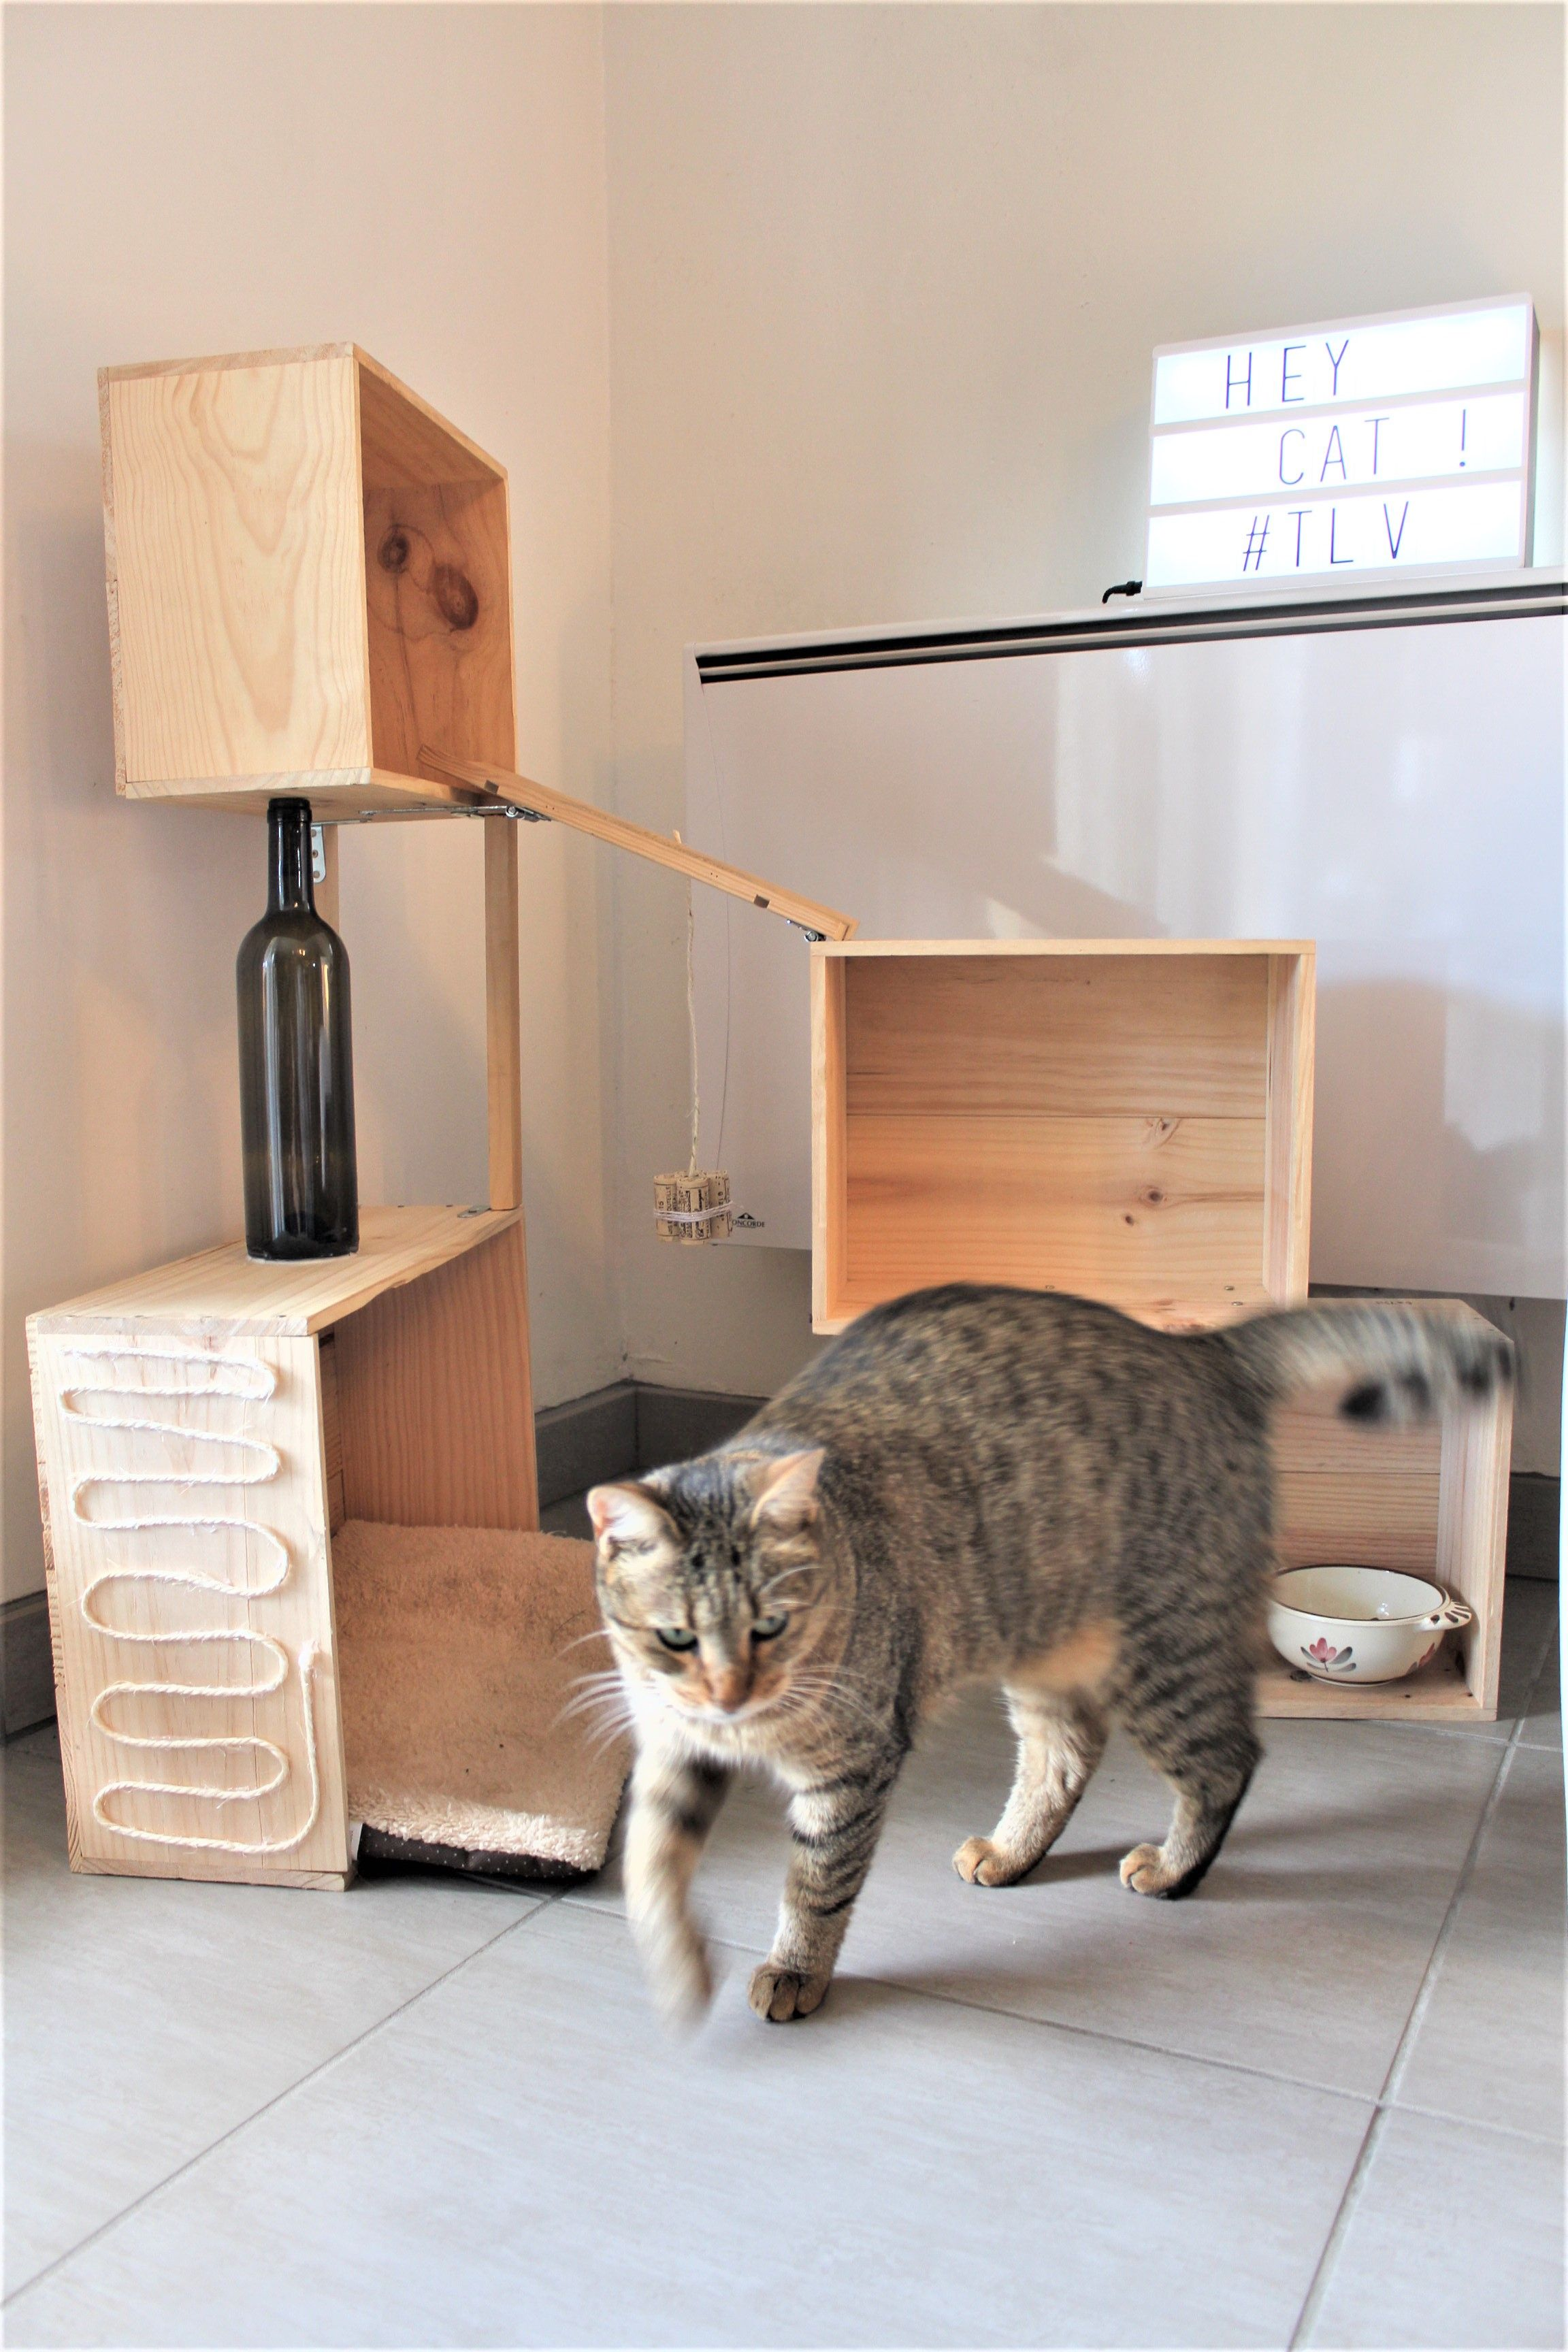 Arbre A Chat Mural Design cat toy tree arbre chat diy wine box wood caisse vin bois